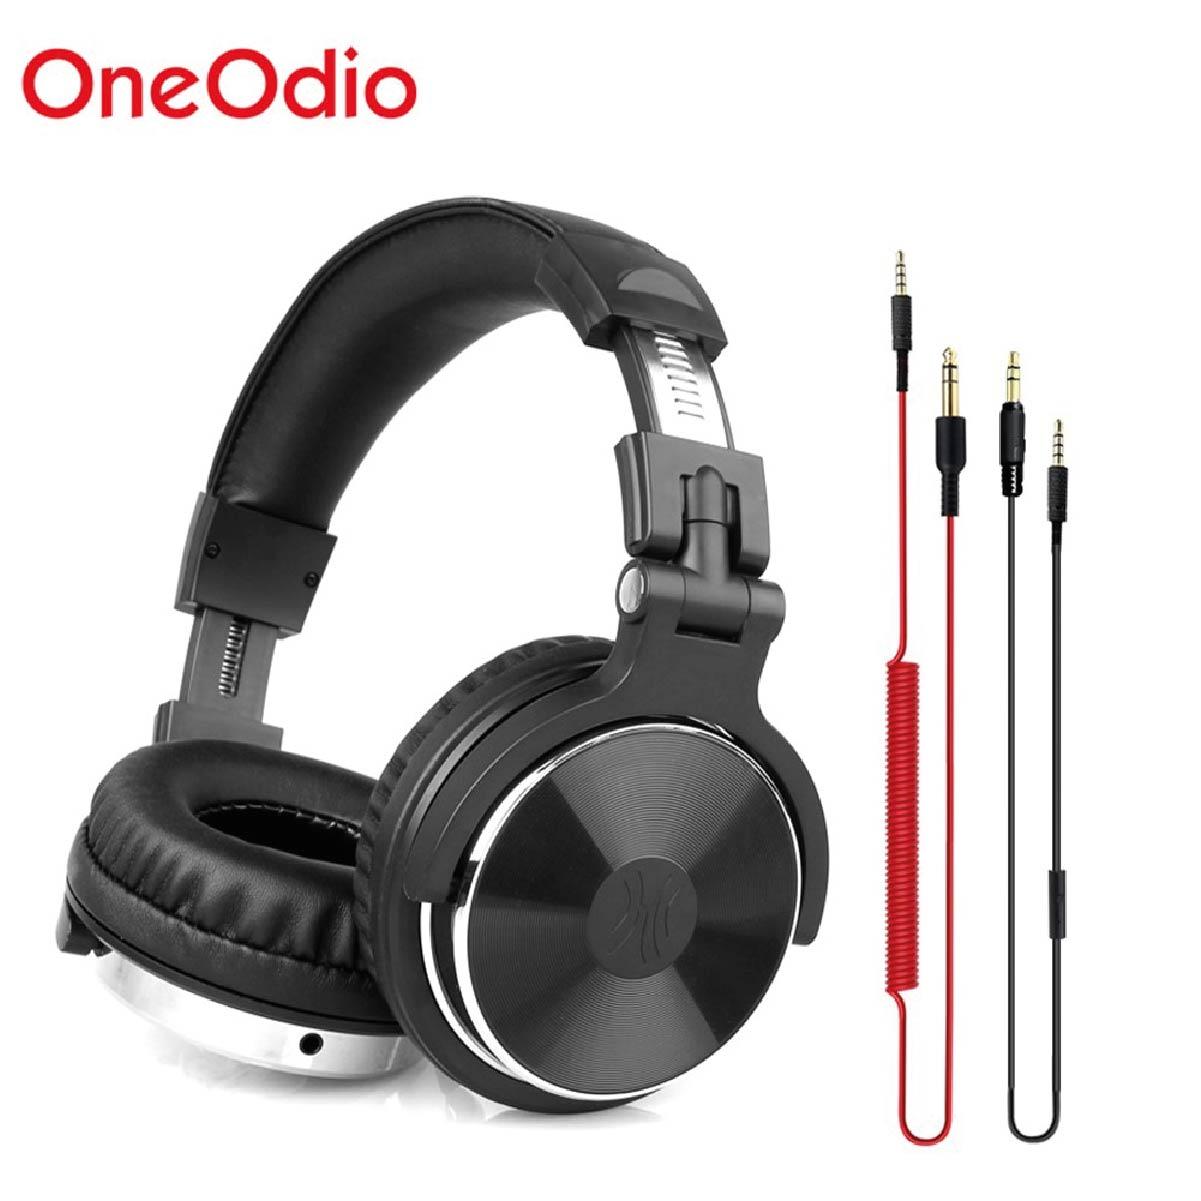 Fone de Ouvido Oneodio Pro10 Black